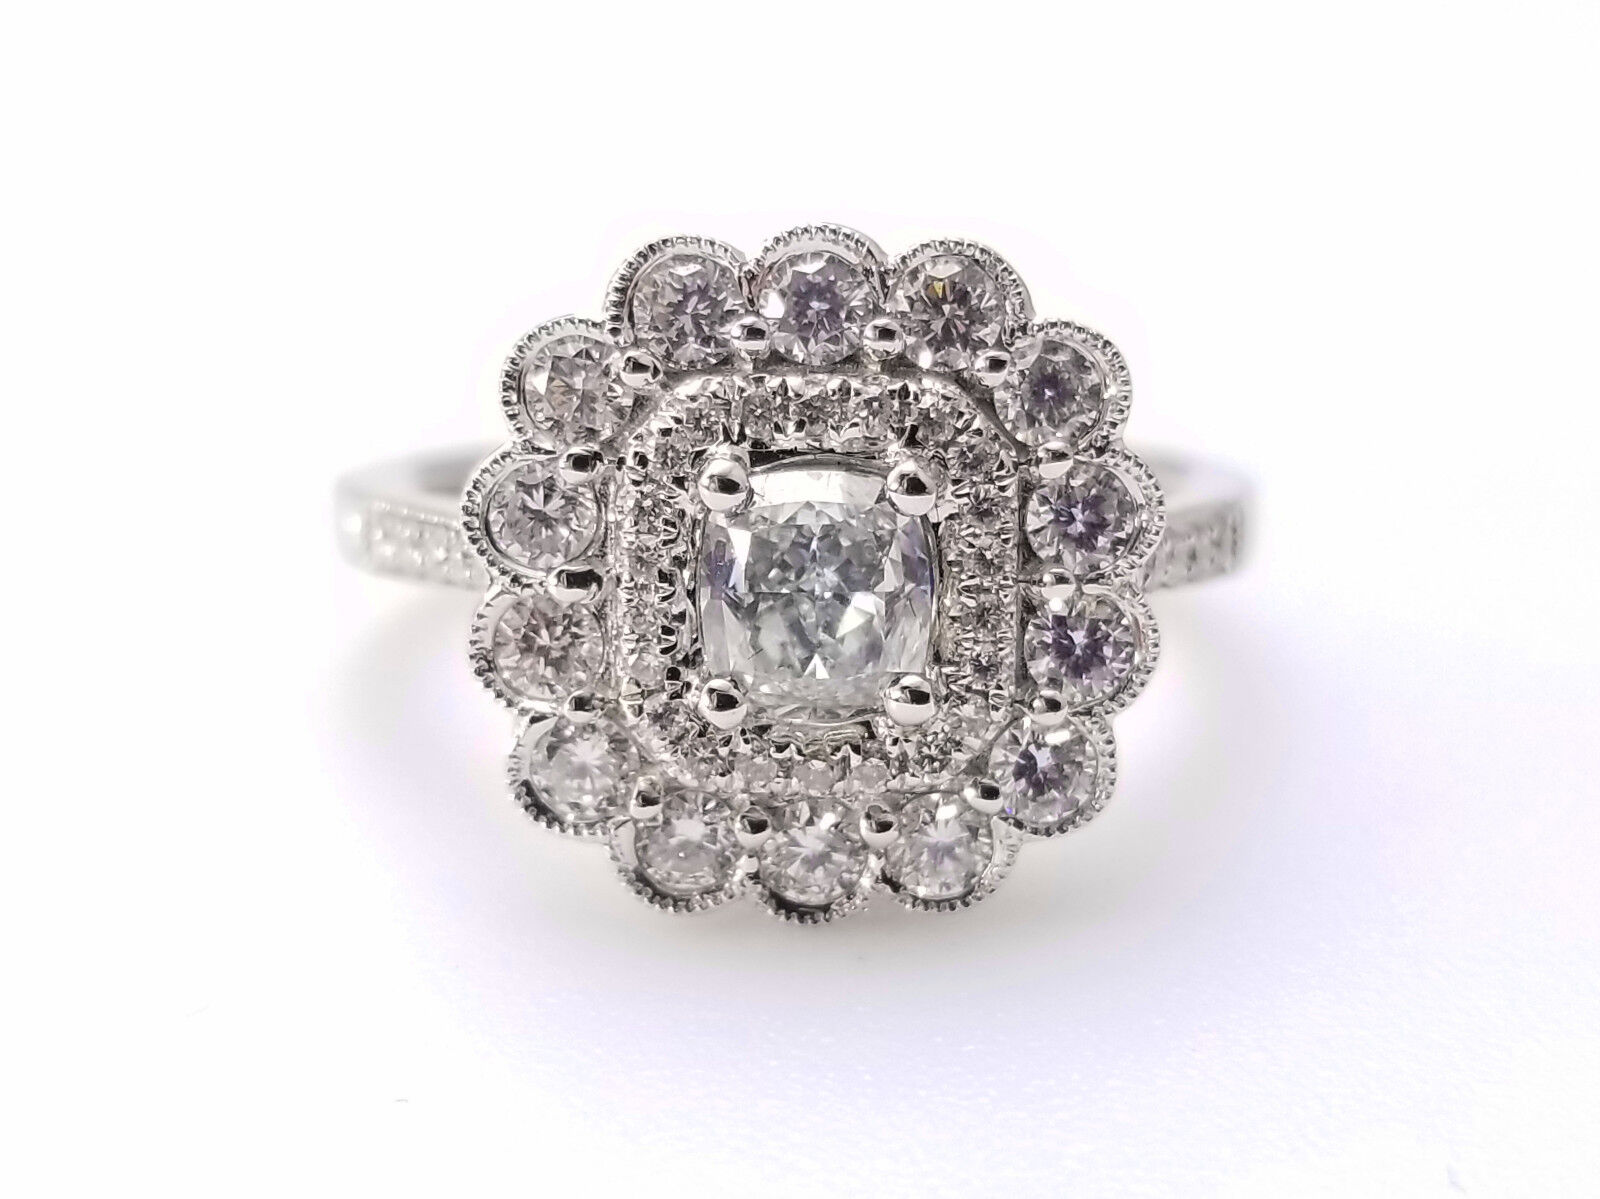 1.03ct Faint Blue Diamond Engagement Ring GIA Cushion Hallo 18K White Gold VS1 2